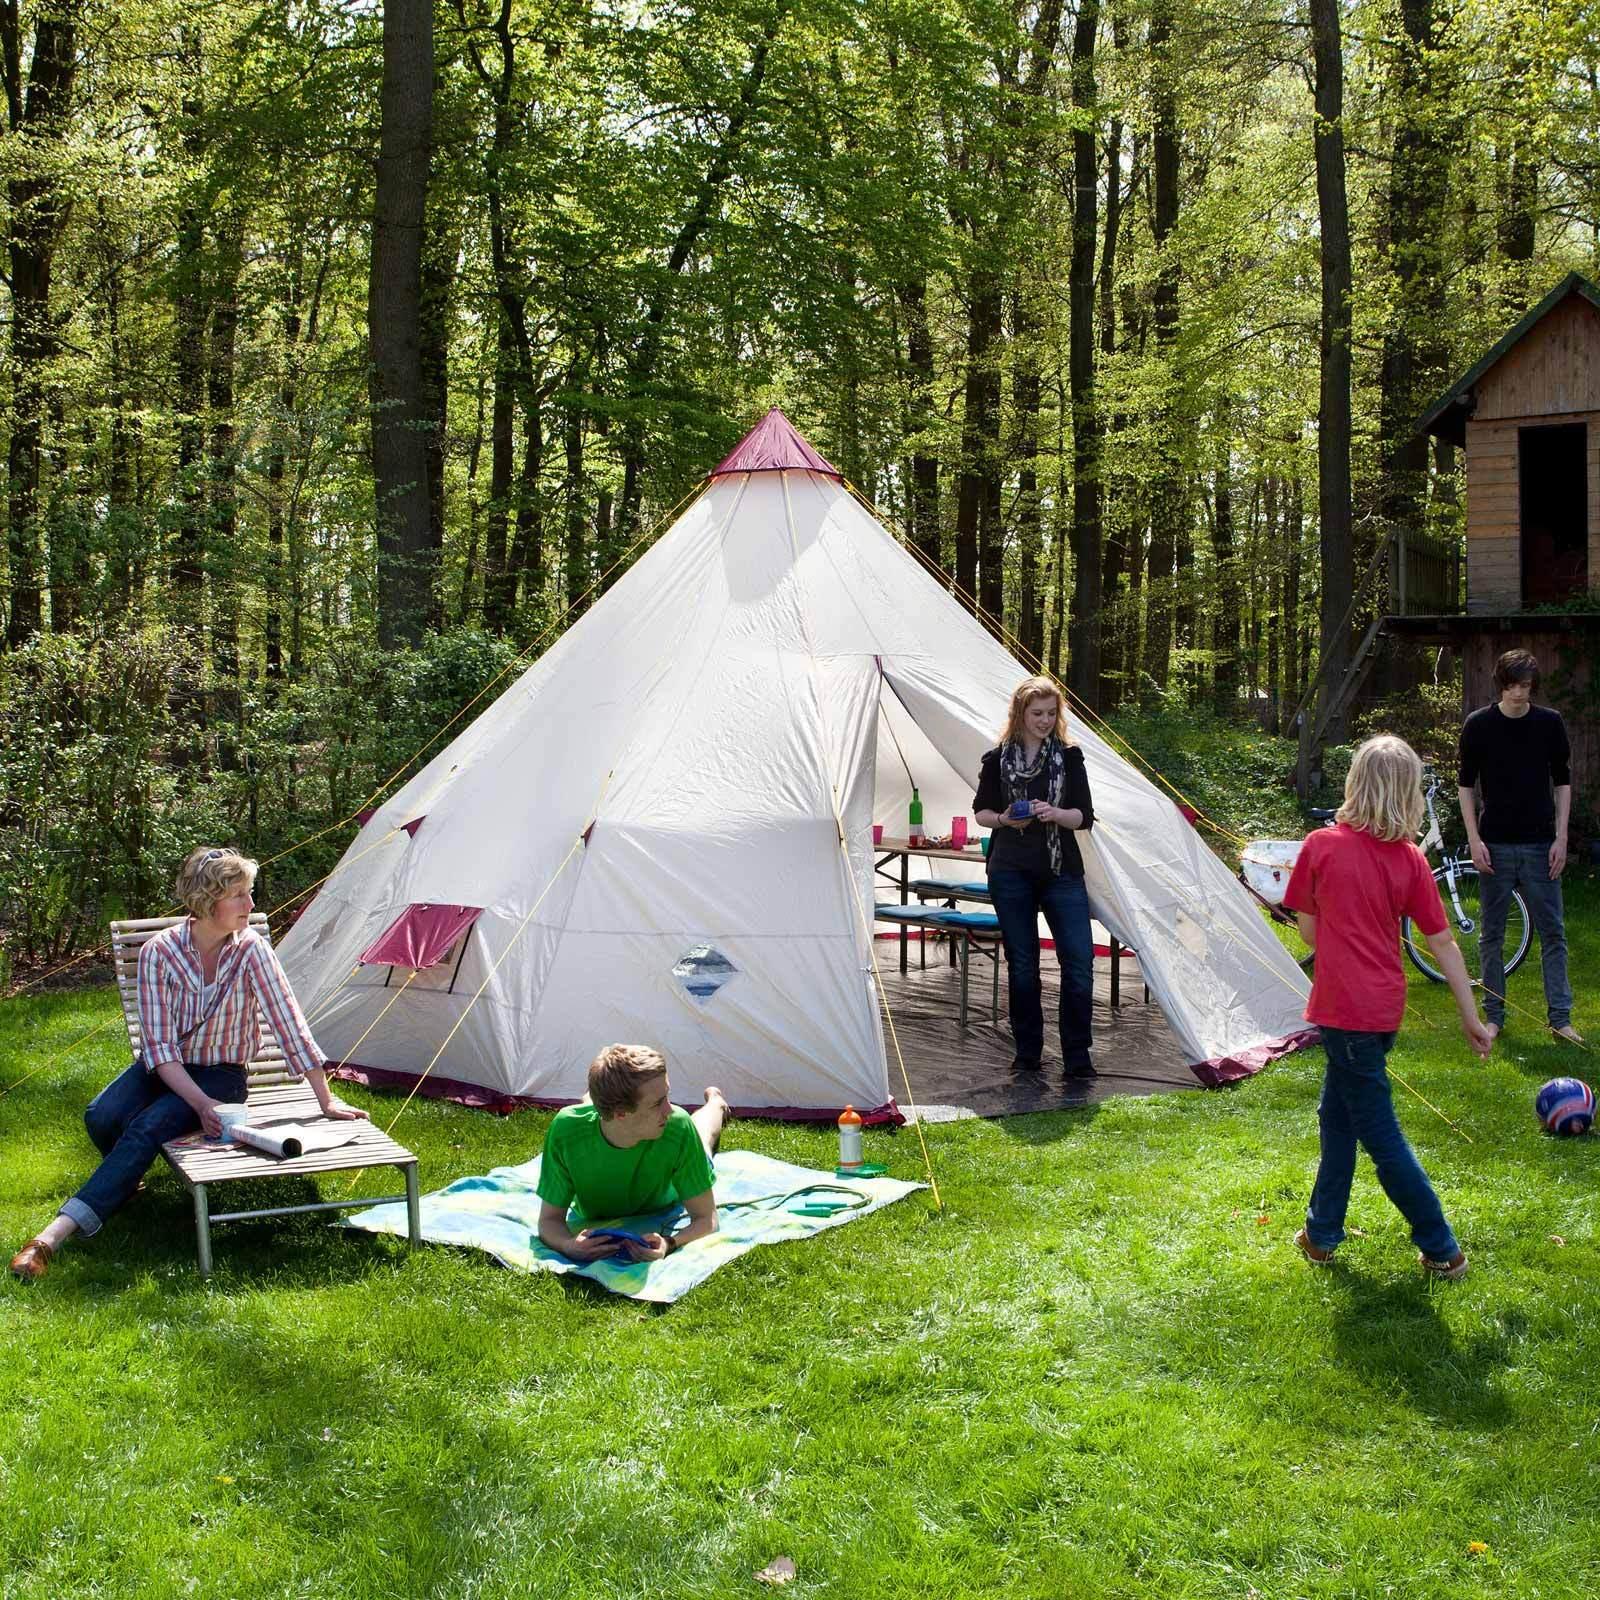 SKANDIKA tipi 300 WIGWAN Tente indianerzelt 12 Personnes Hauteur 3 m Beige NEUF